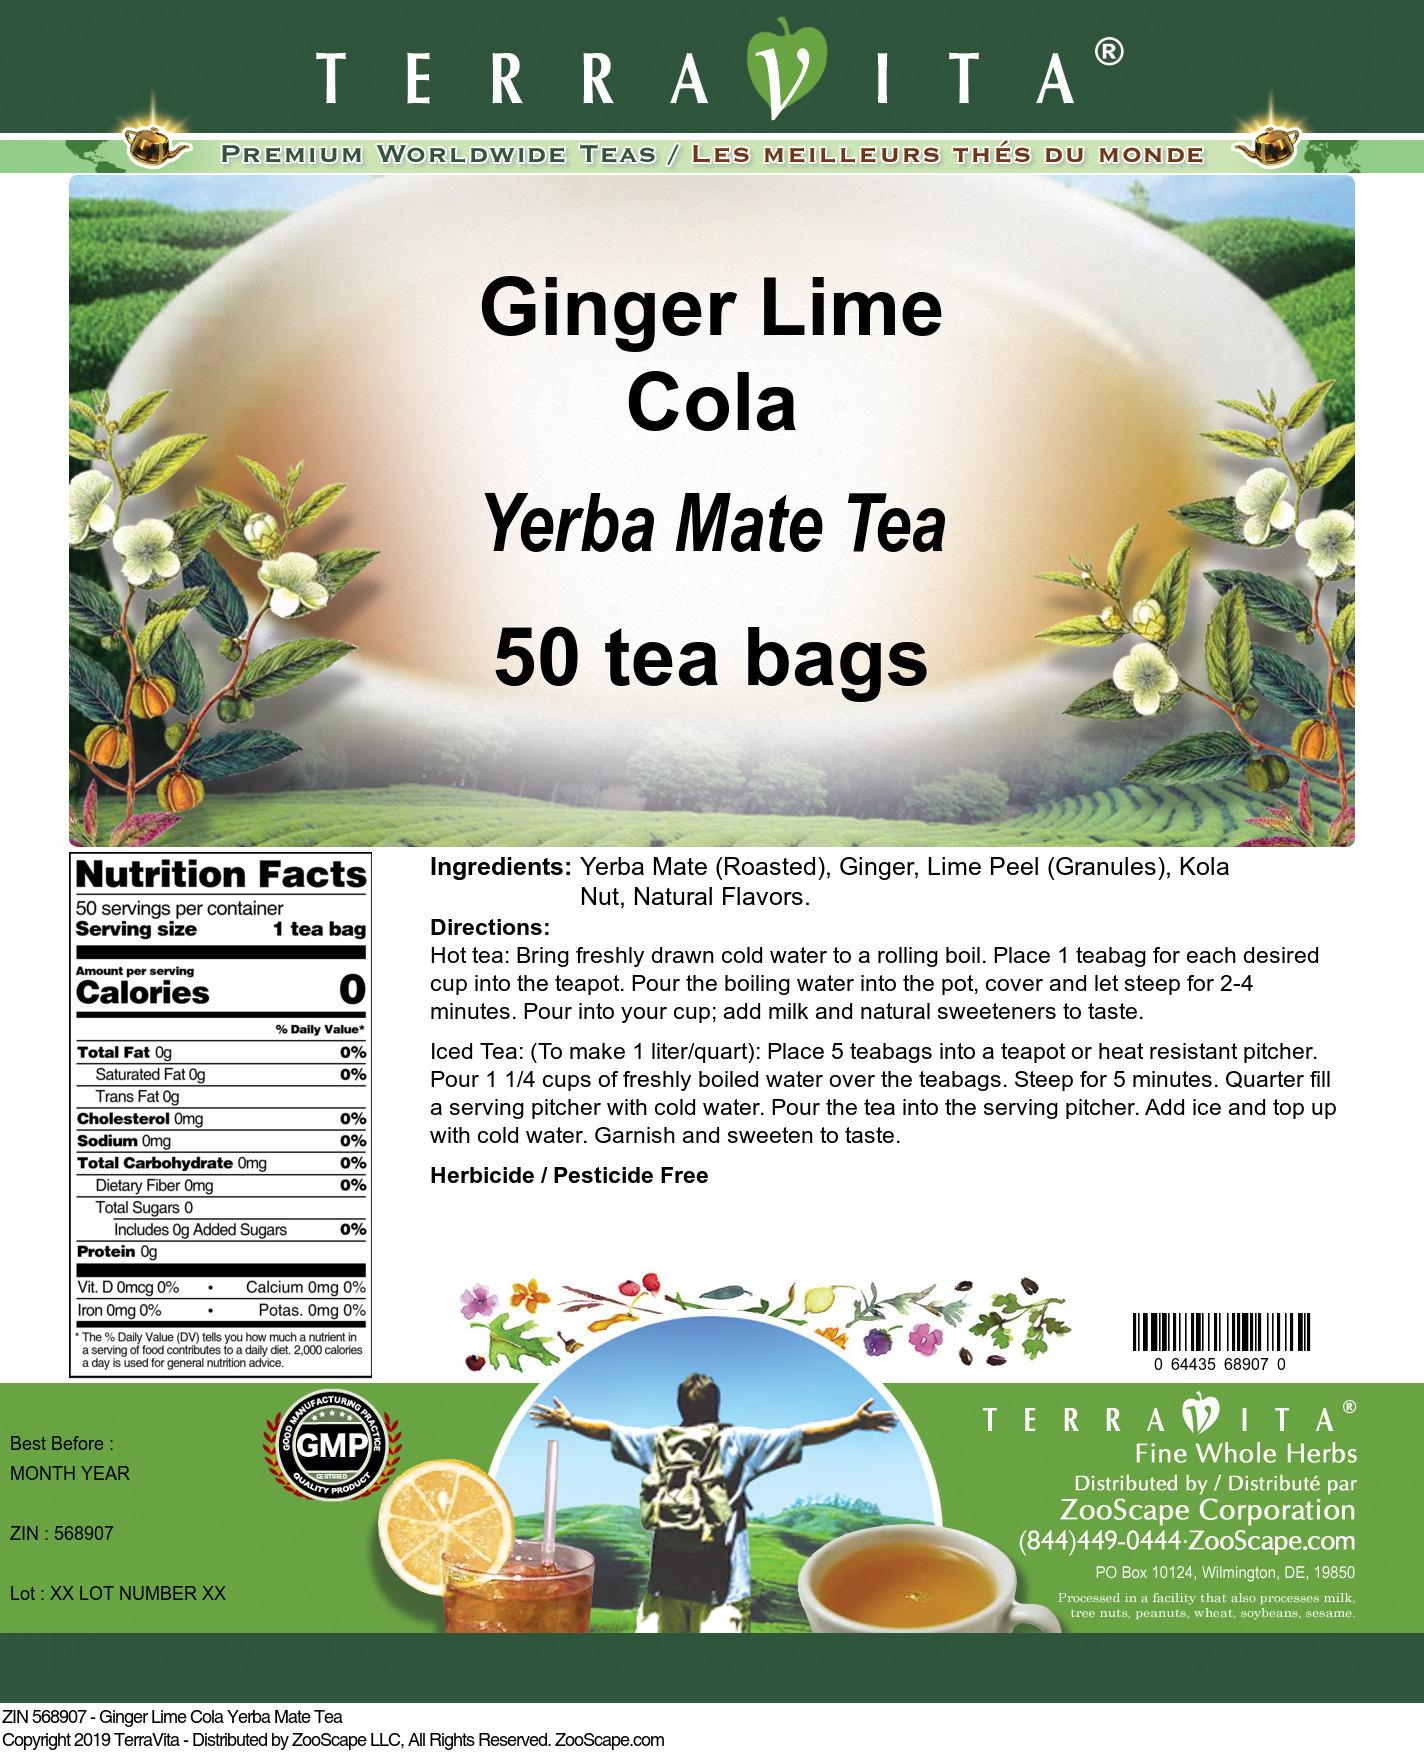 Ginger Lime Cola Yerba Mate Tea